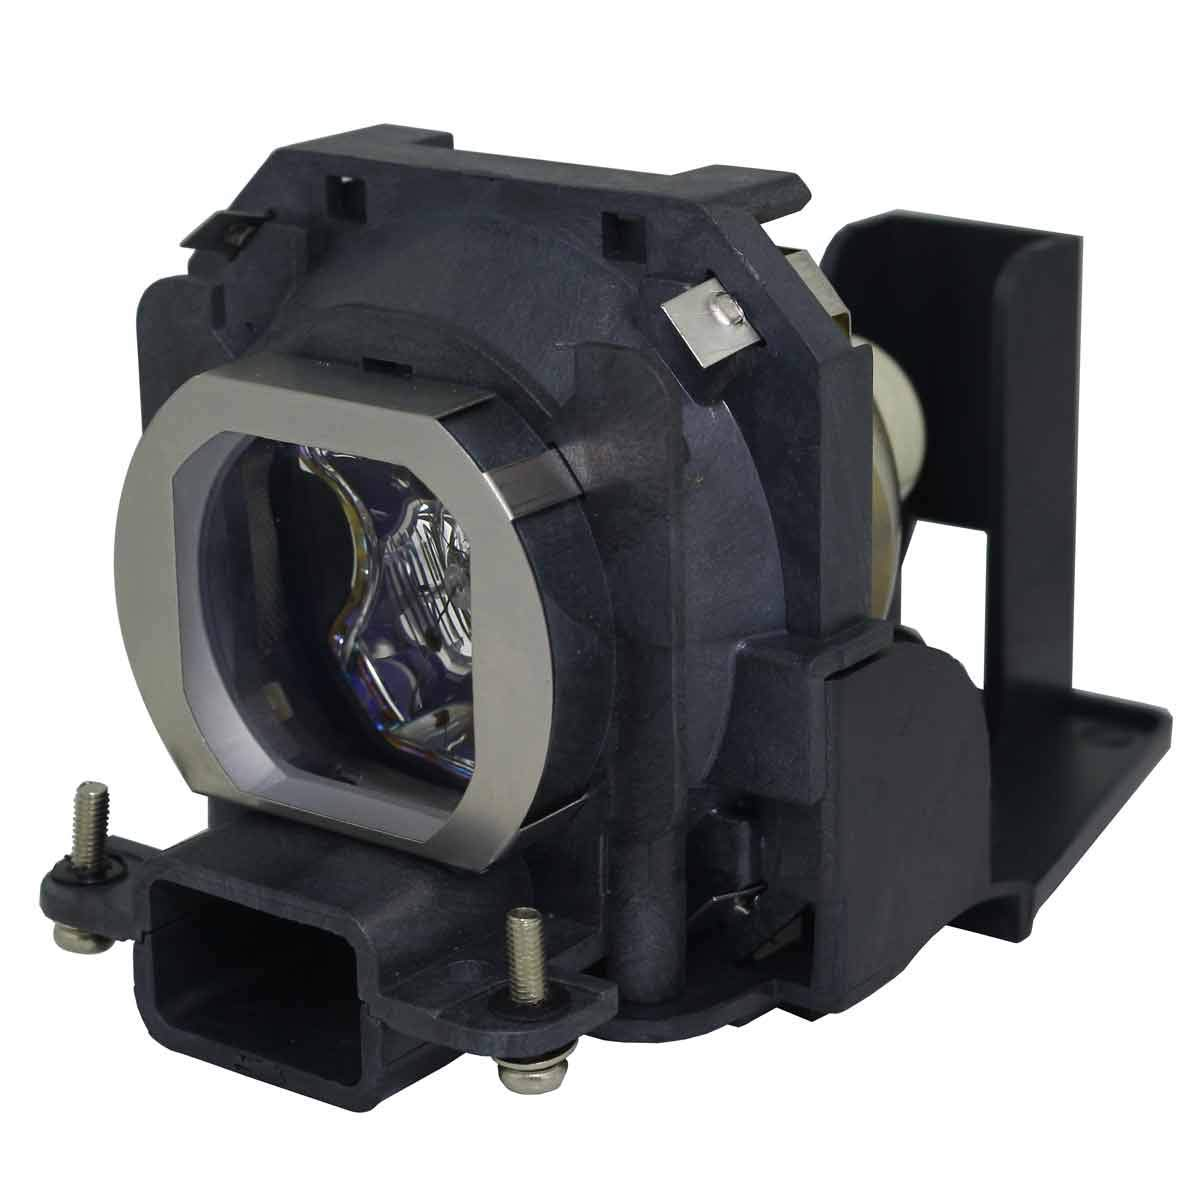 ET-LAB30 Projector Lamp For Panasonic PT-LB55 PT-LB55EA PT-LB30 PT-LB30U PT-LB60U LB30NTE LB30NTU LB55NTE LB60NT LB60NTE LB60NTU